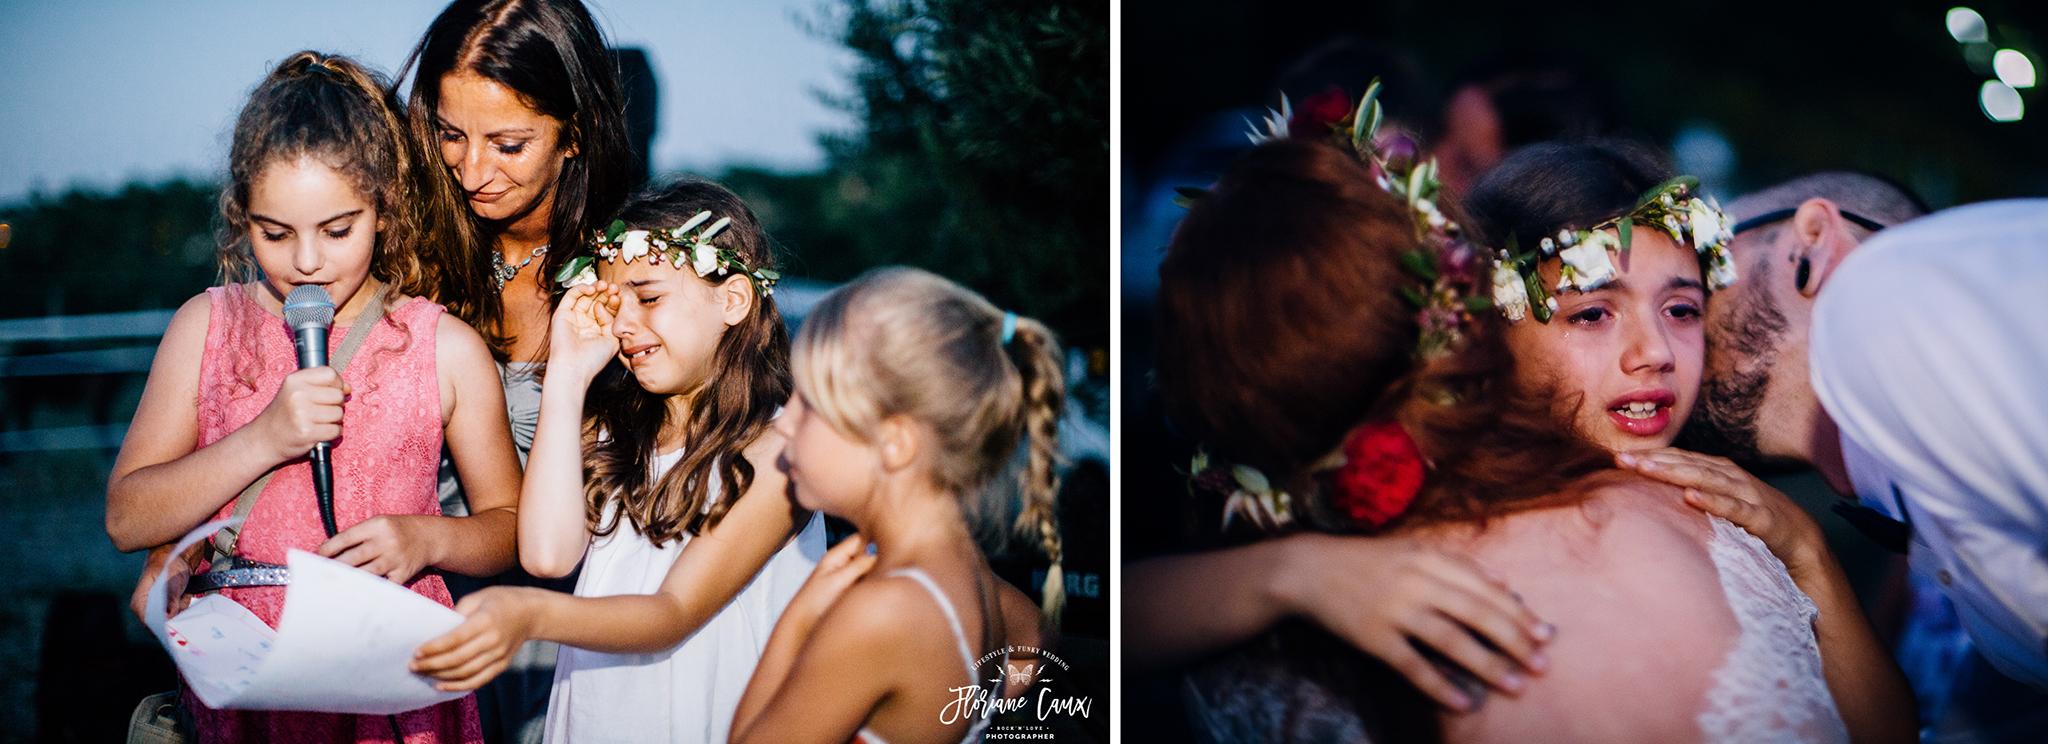 photographe-mariage-toulouse-rocknroll-maries-tatoues-floriane-caux-120